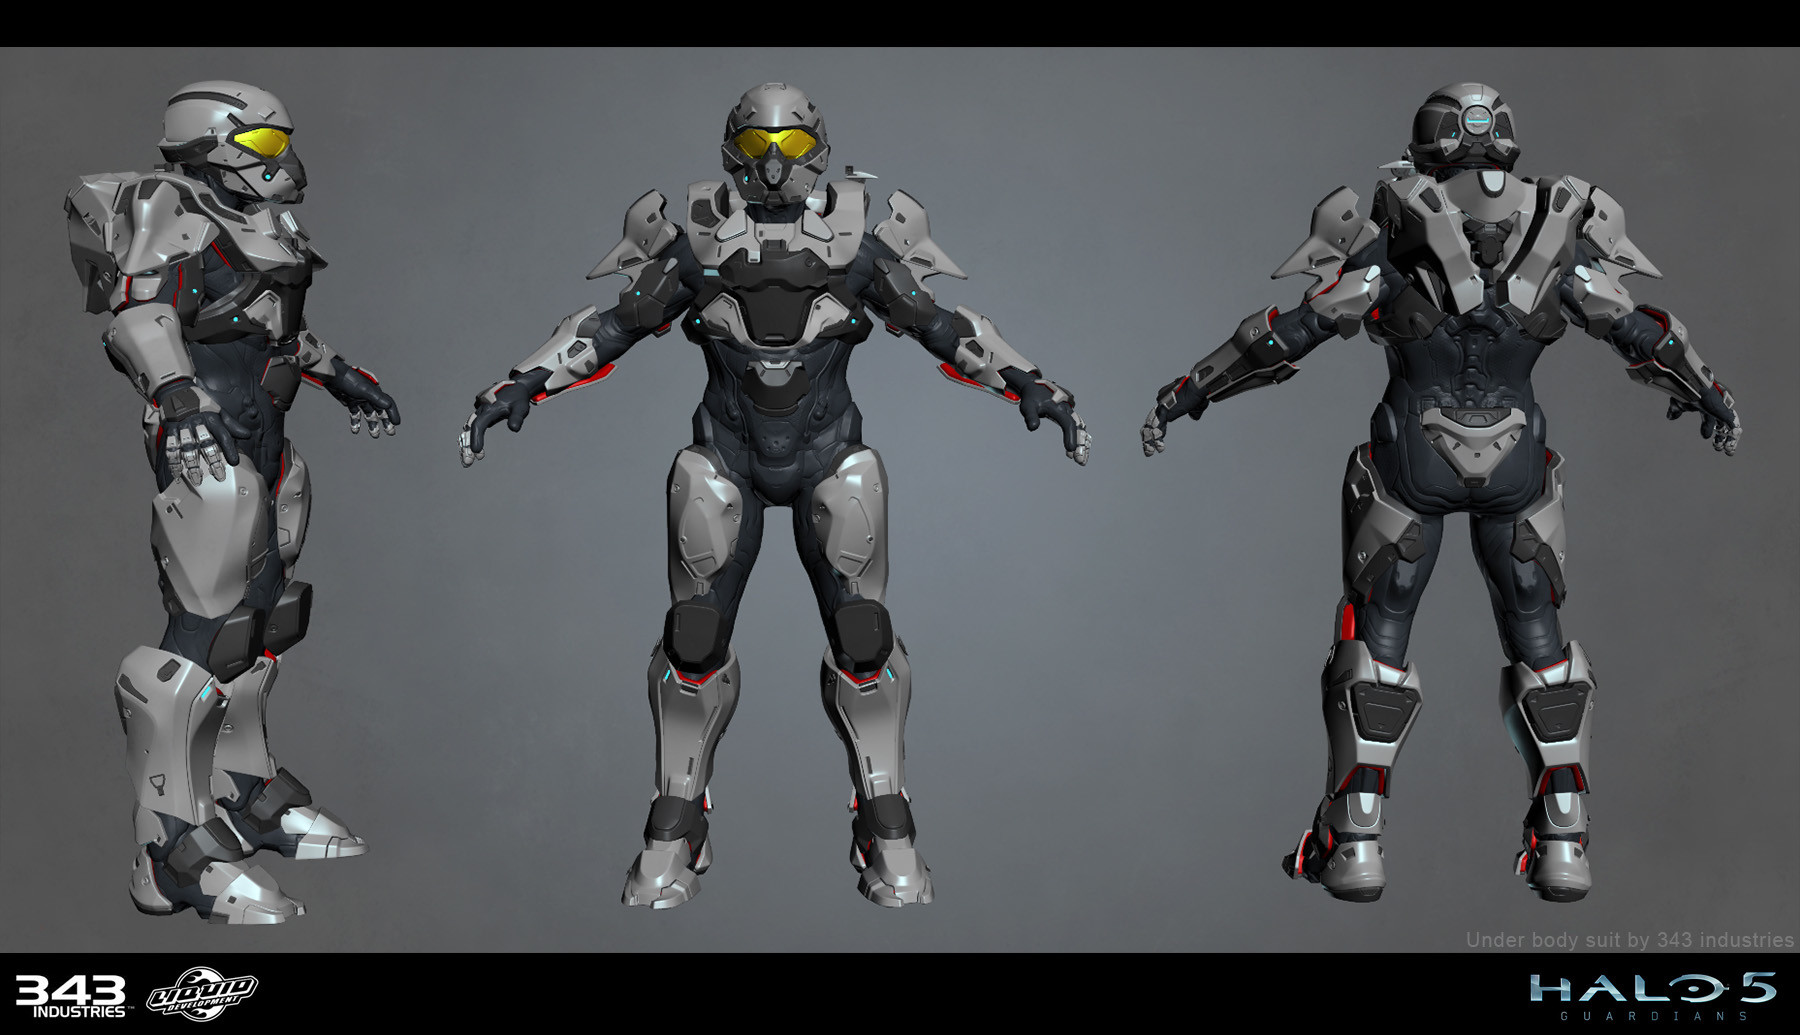 ArtStation - Halo 5 - Multiplayer Armor, Aaron Cruz